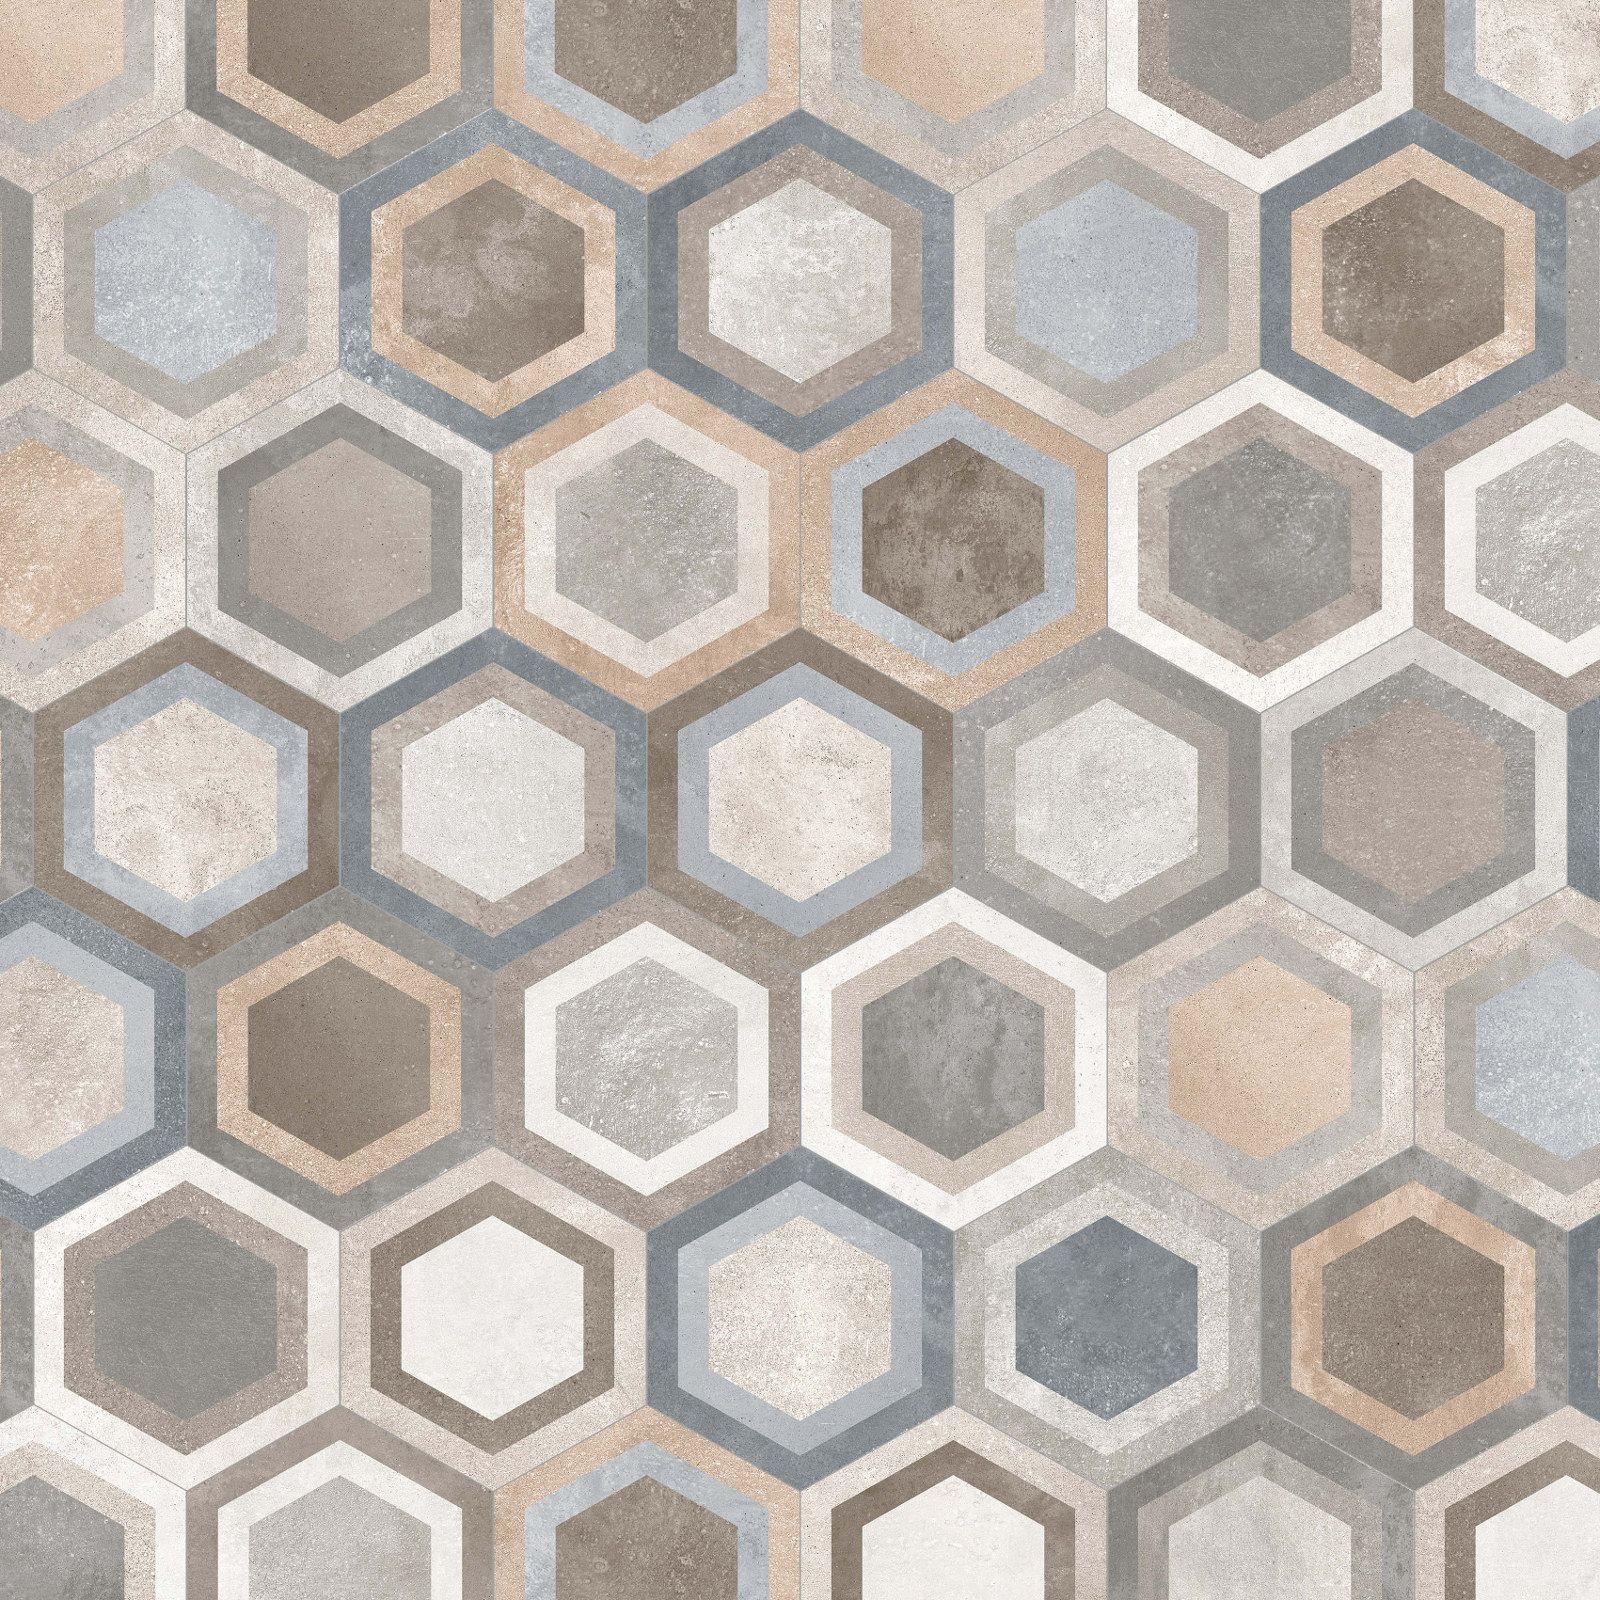 Serie de pavimento Rift en formato 23X26,6 cm., fabricada de ...